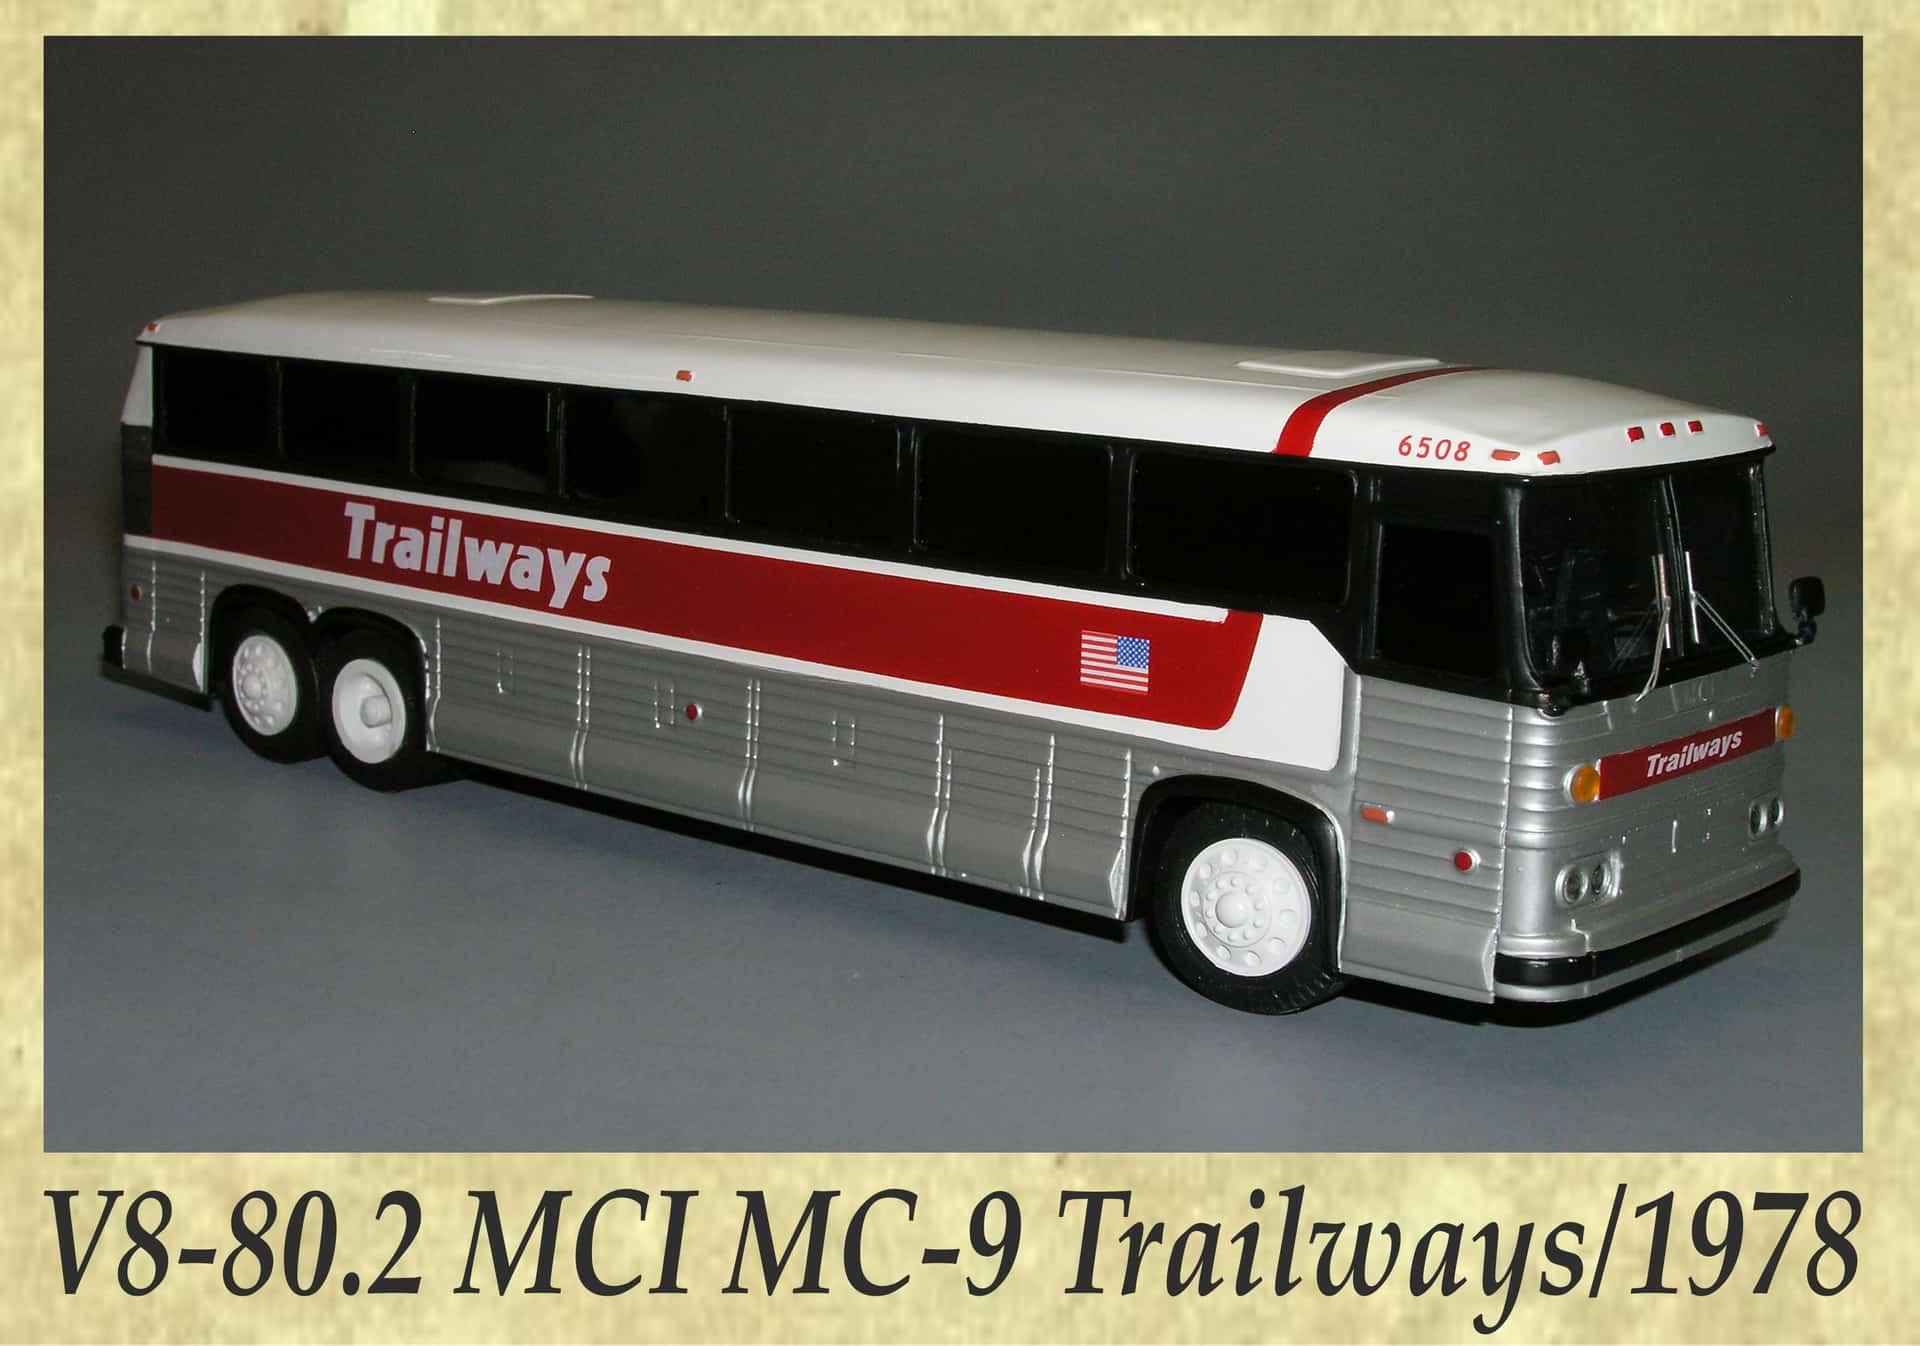 V8-80.2 MCI MC-9 Trailways 1978